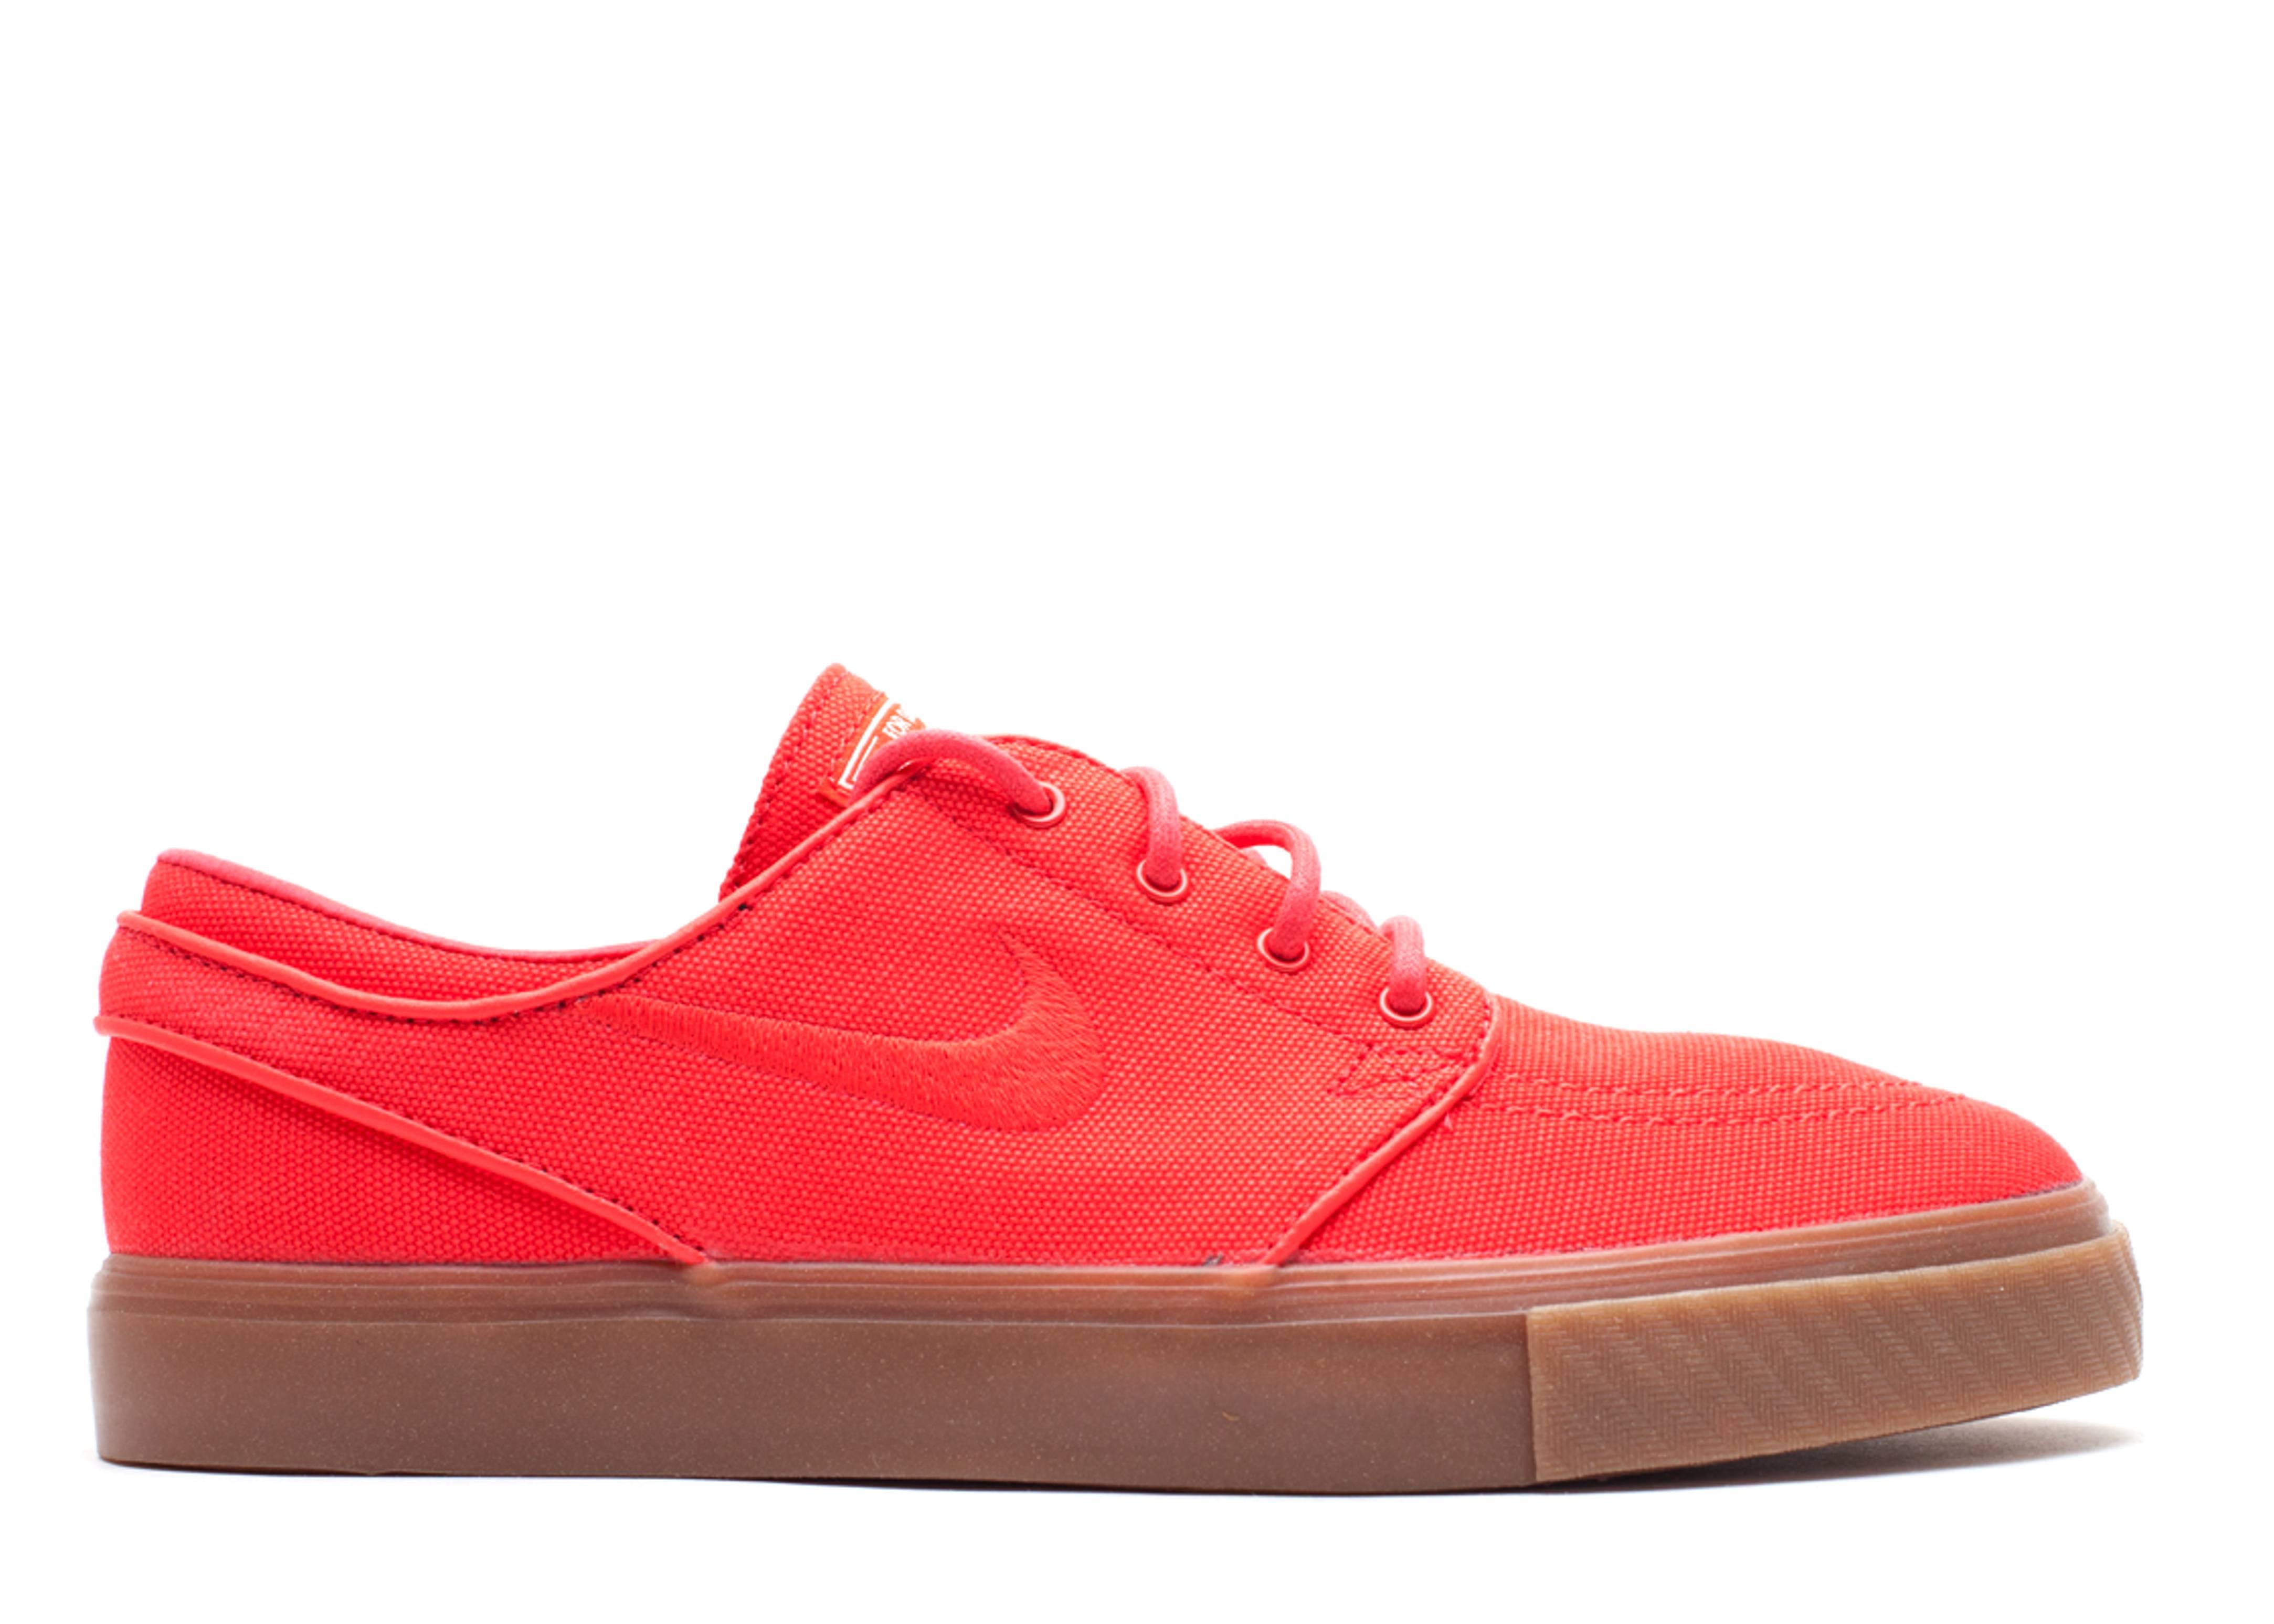 63a73f6e06ab Zoom Stefan Janoski - Nike - 333824 662 - hyper red hyper red sail ...